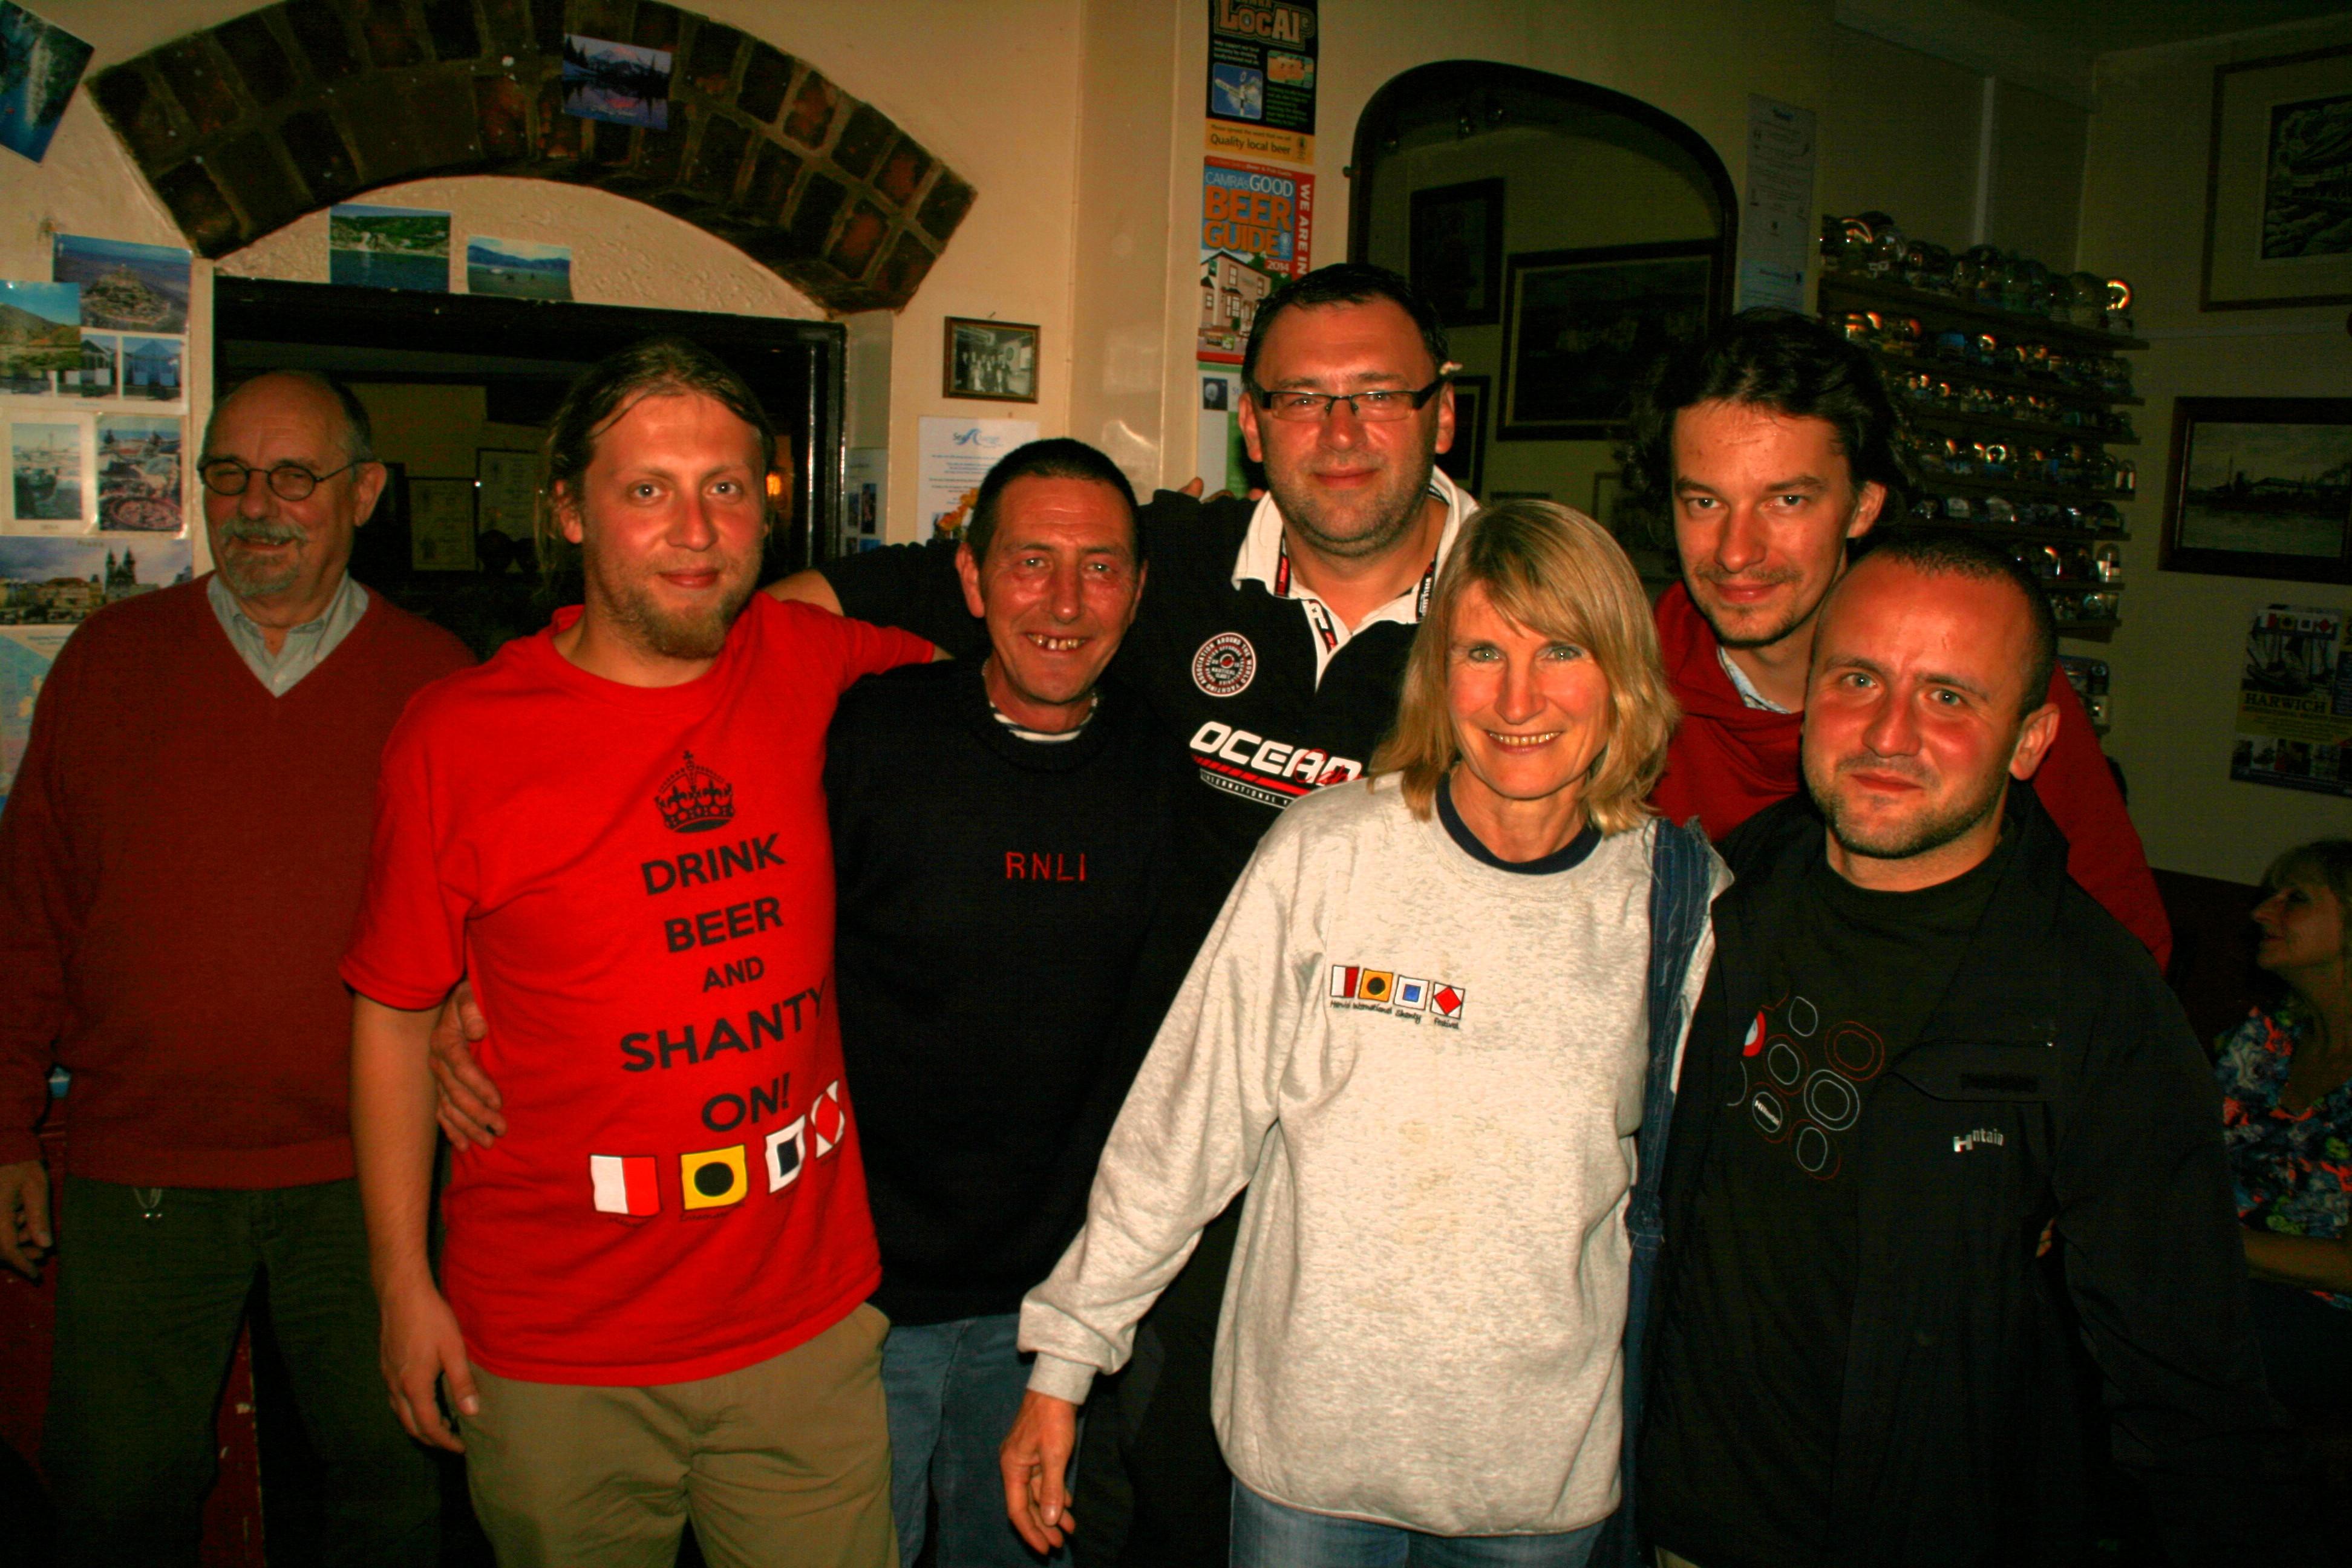 The survivors, including Pam Fitzgerald, Harwich Shanty Festival Diretor